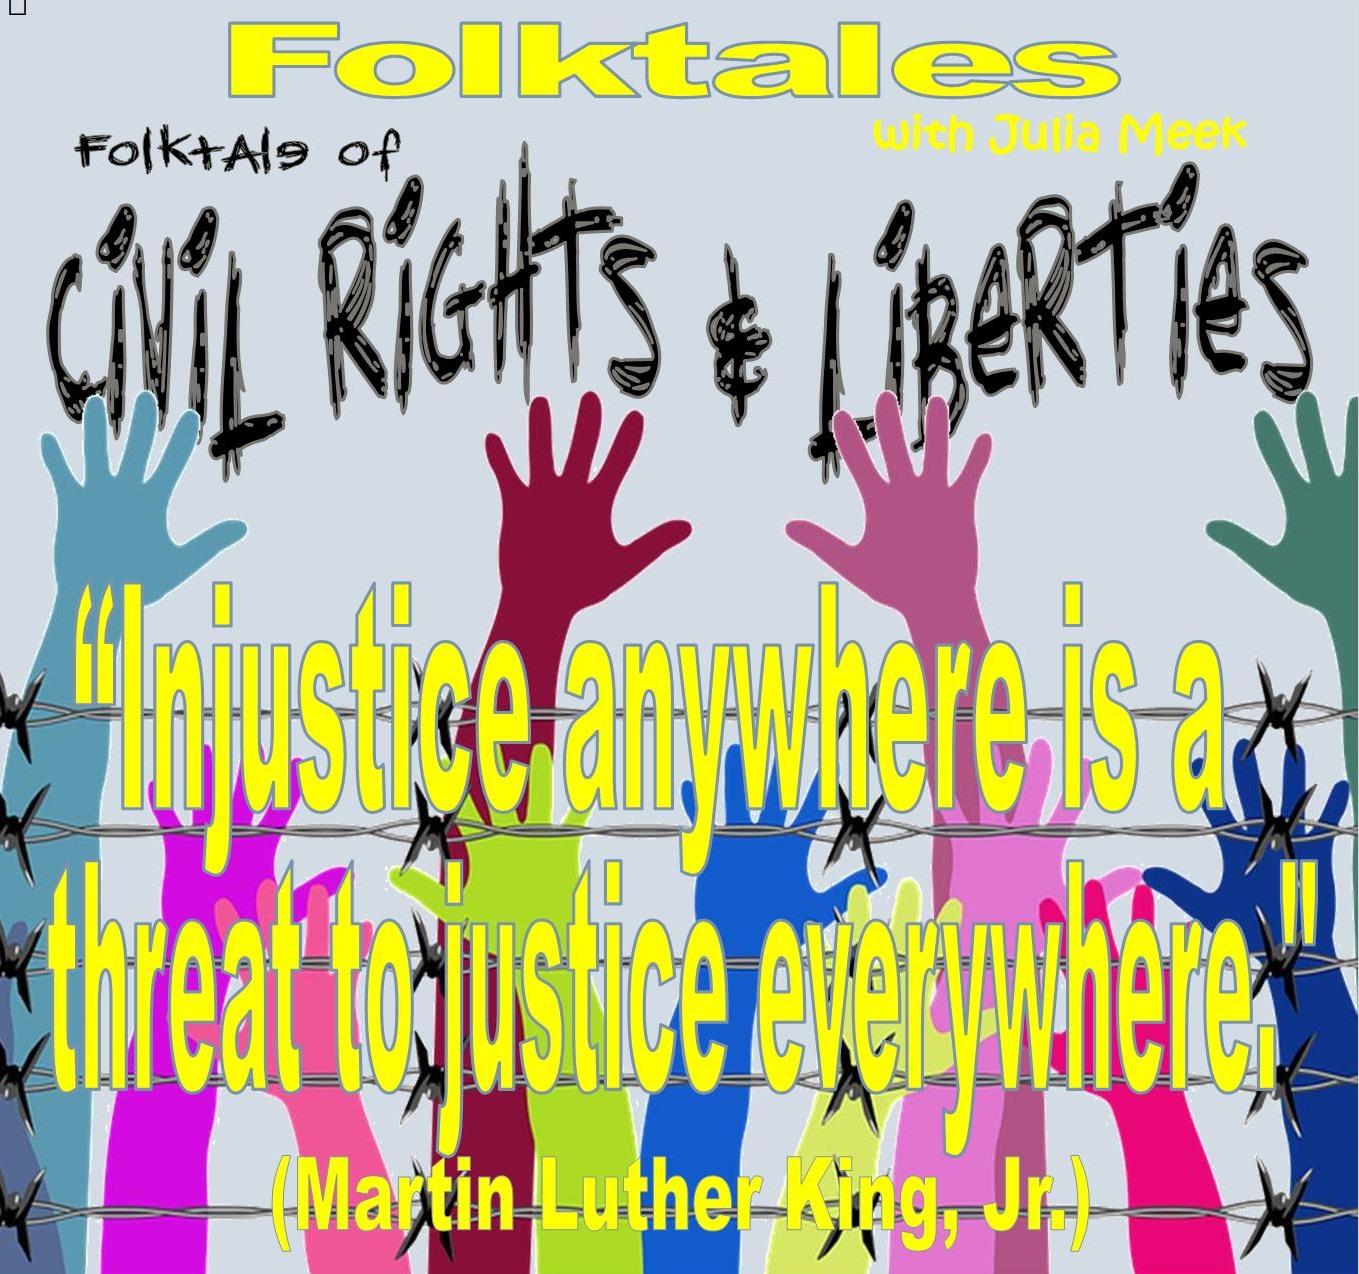 Caption: WBOI's Folktale of Civil Rights & Liberties, Credit: Julia Meek